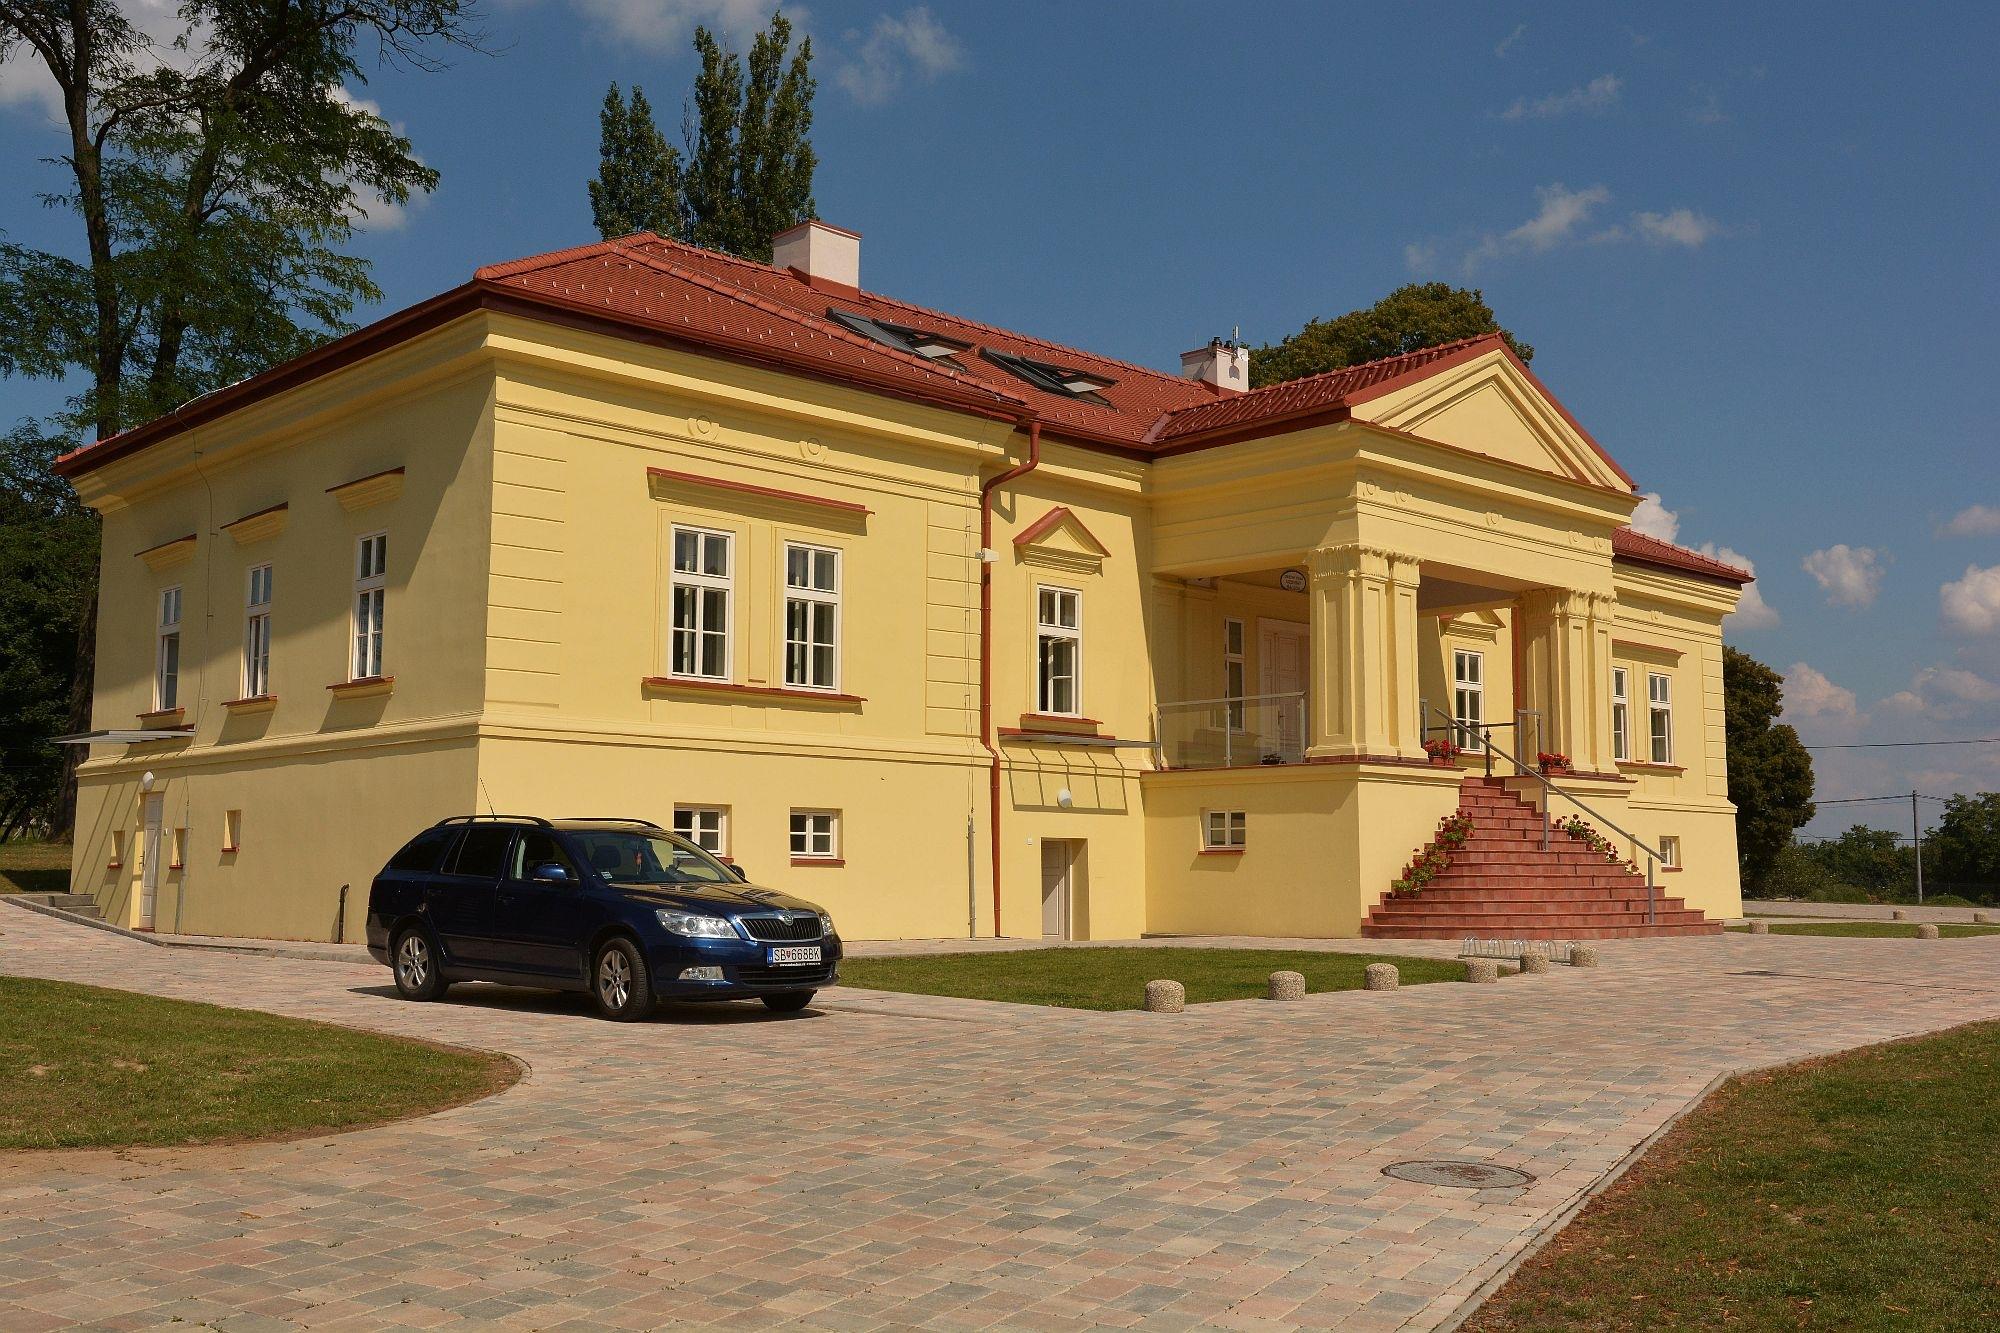 Pechy manor house. (Slovakia) by PHOTOdistrict